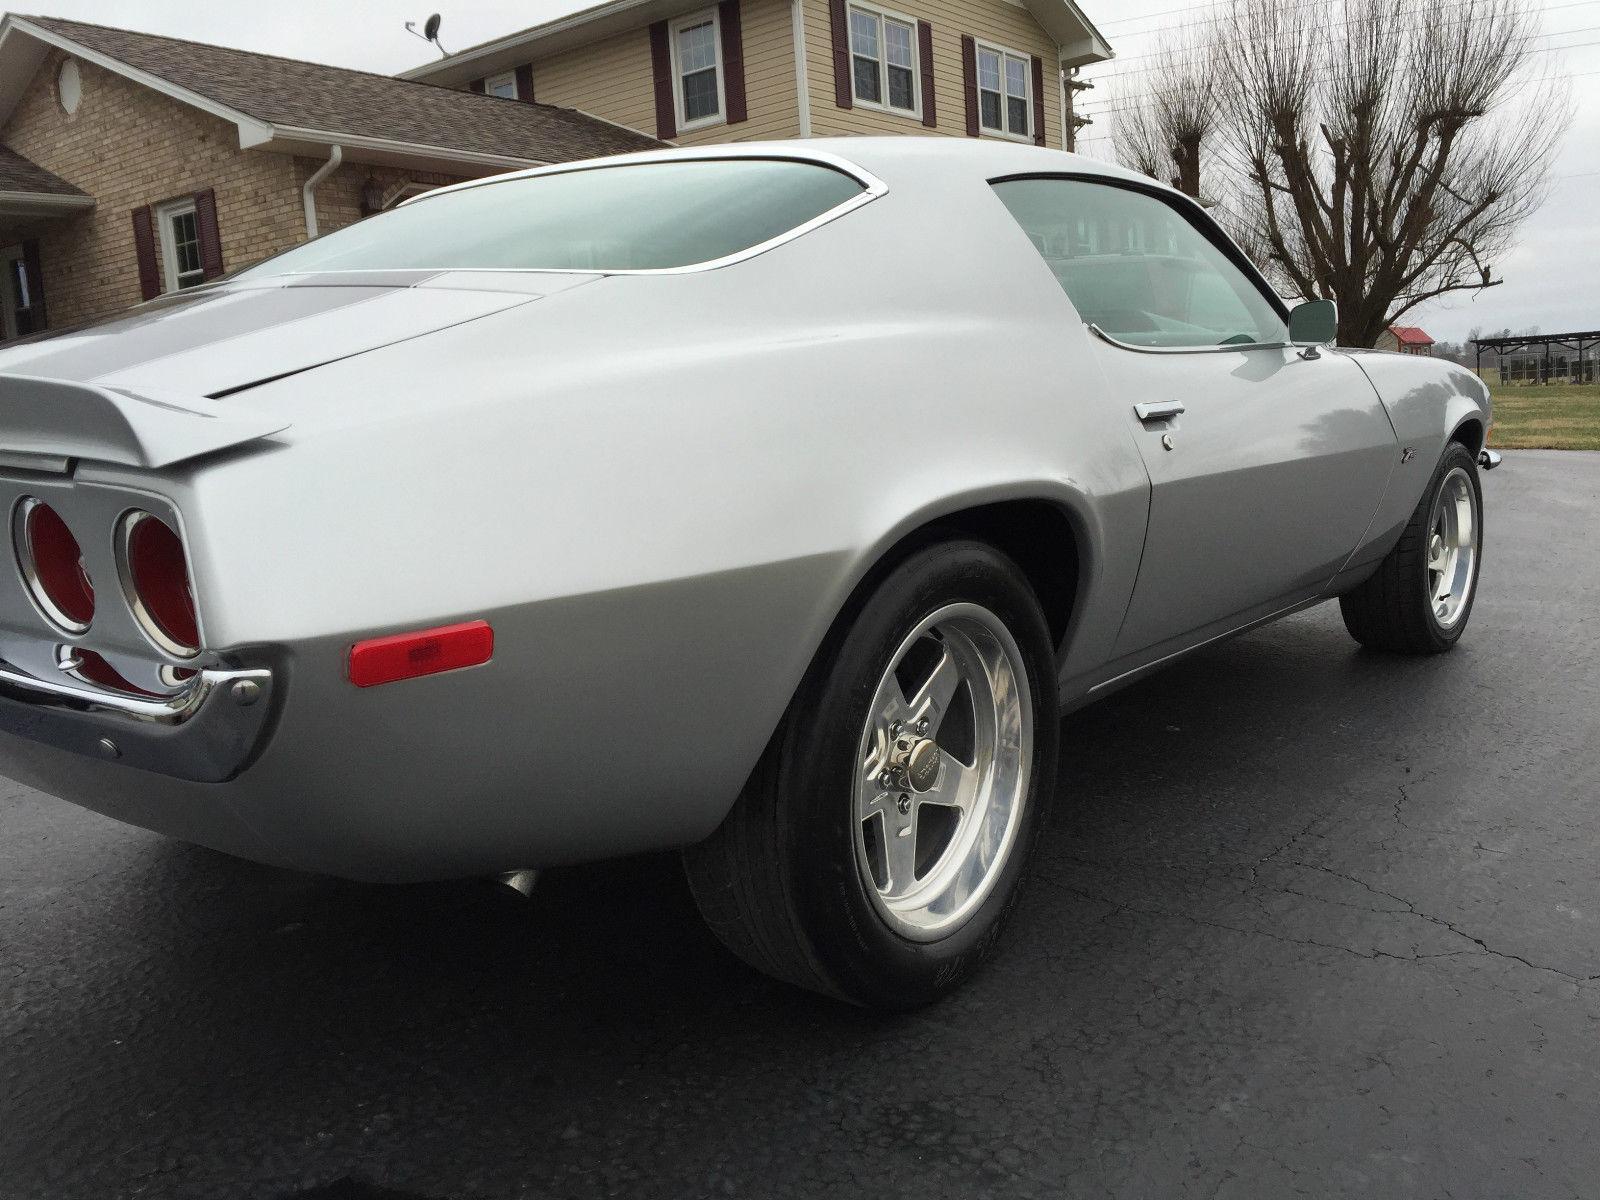 1970 chevy camaro z28 clone running a rebuilt 355 engine auto cortez silver. Black Bedroom Furniture Sets. Home Design Ideas